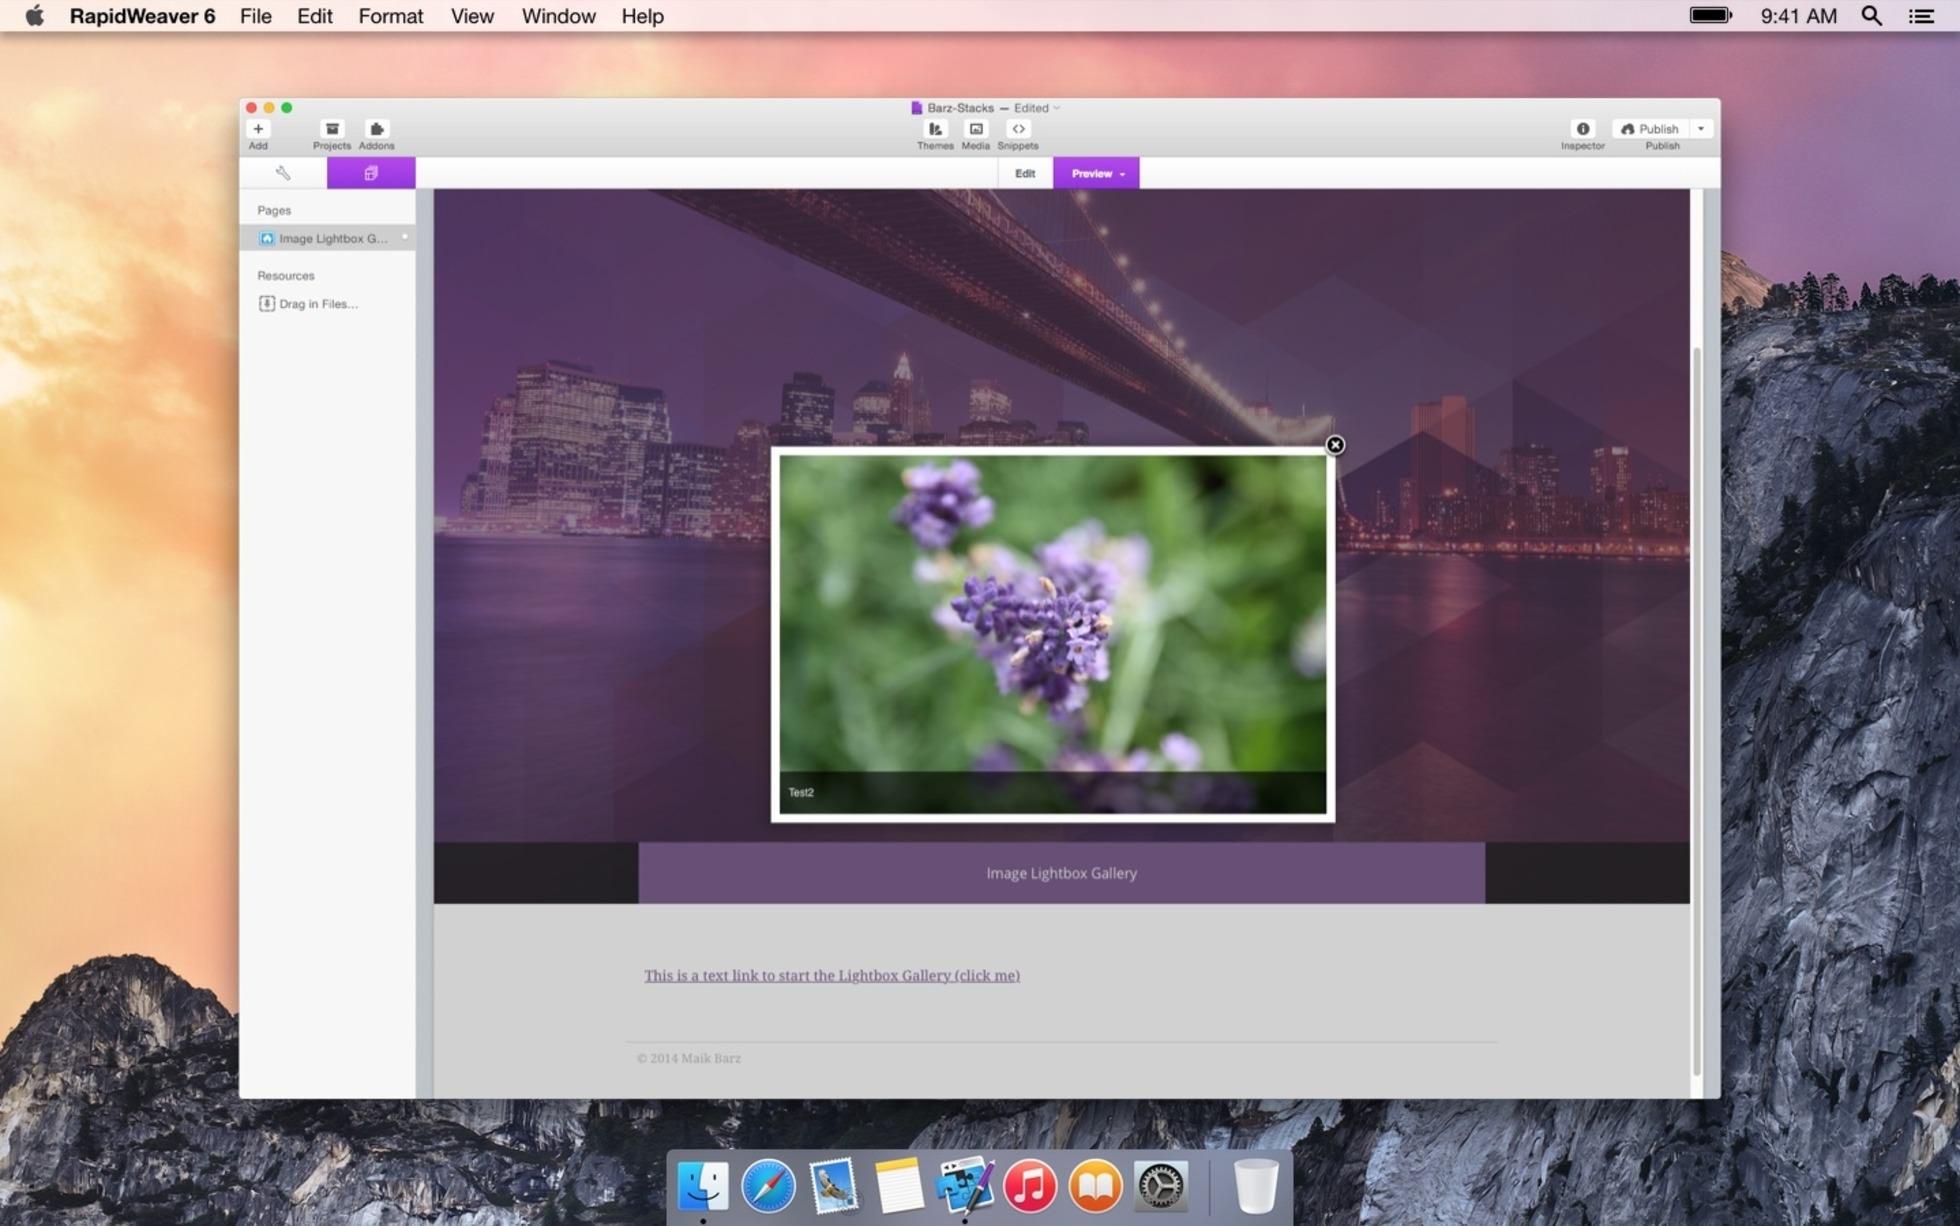 Image LightBox Gallery screenshot